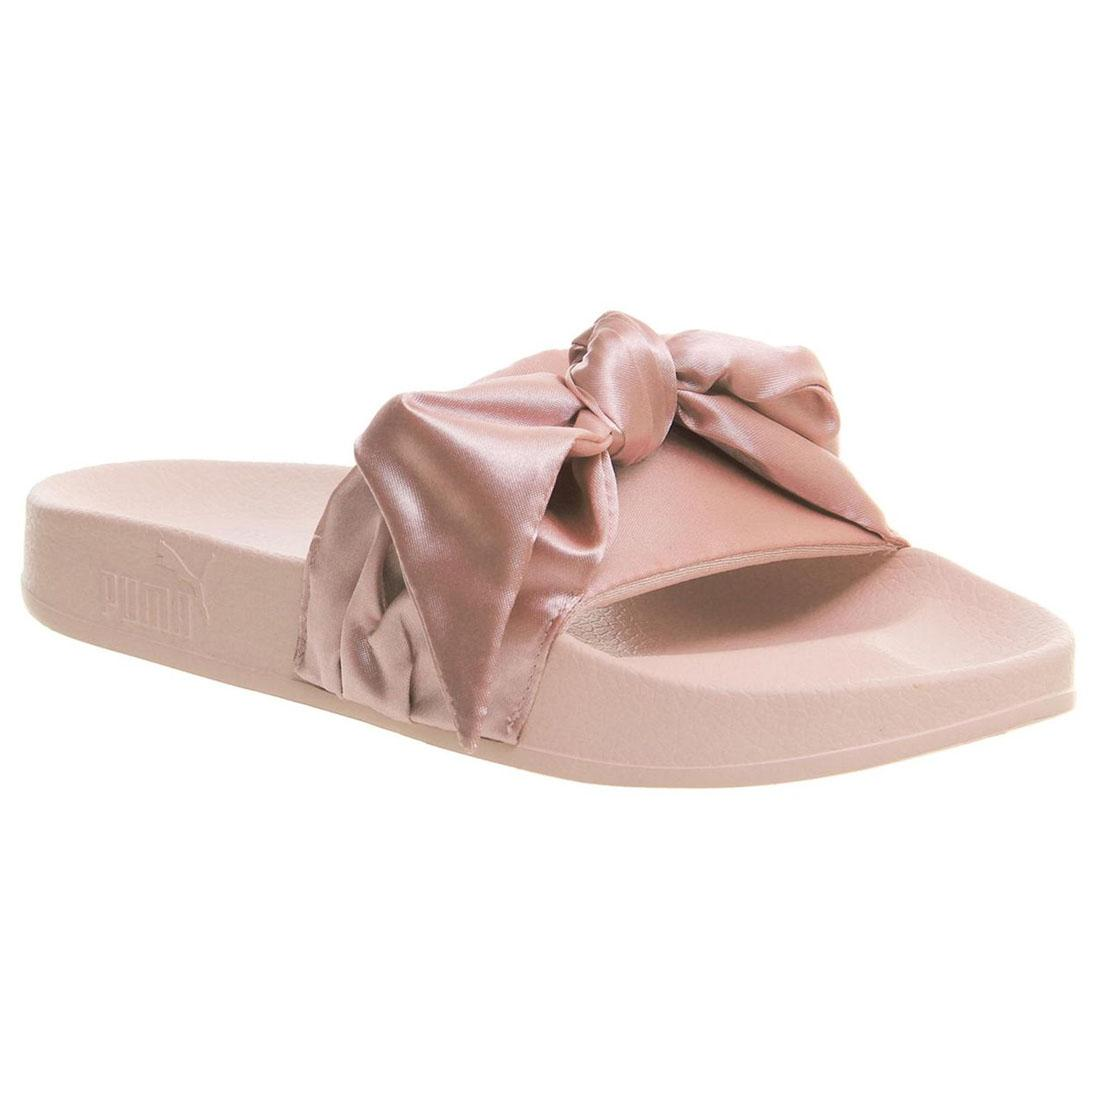 quality design 12c57 9714d Details about PUMA Fenty X By Rihanna Womens Bow Slides Ladies White Pink  365774 02 03